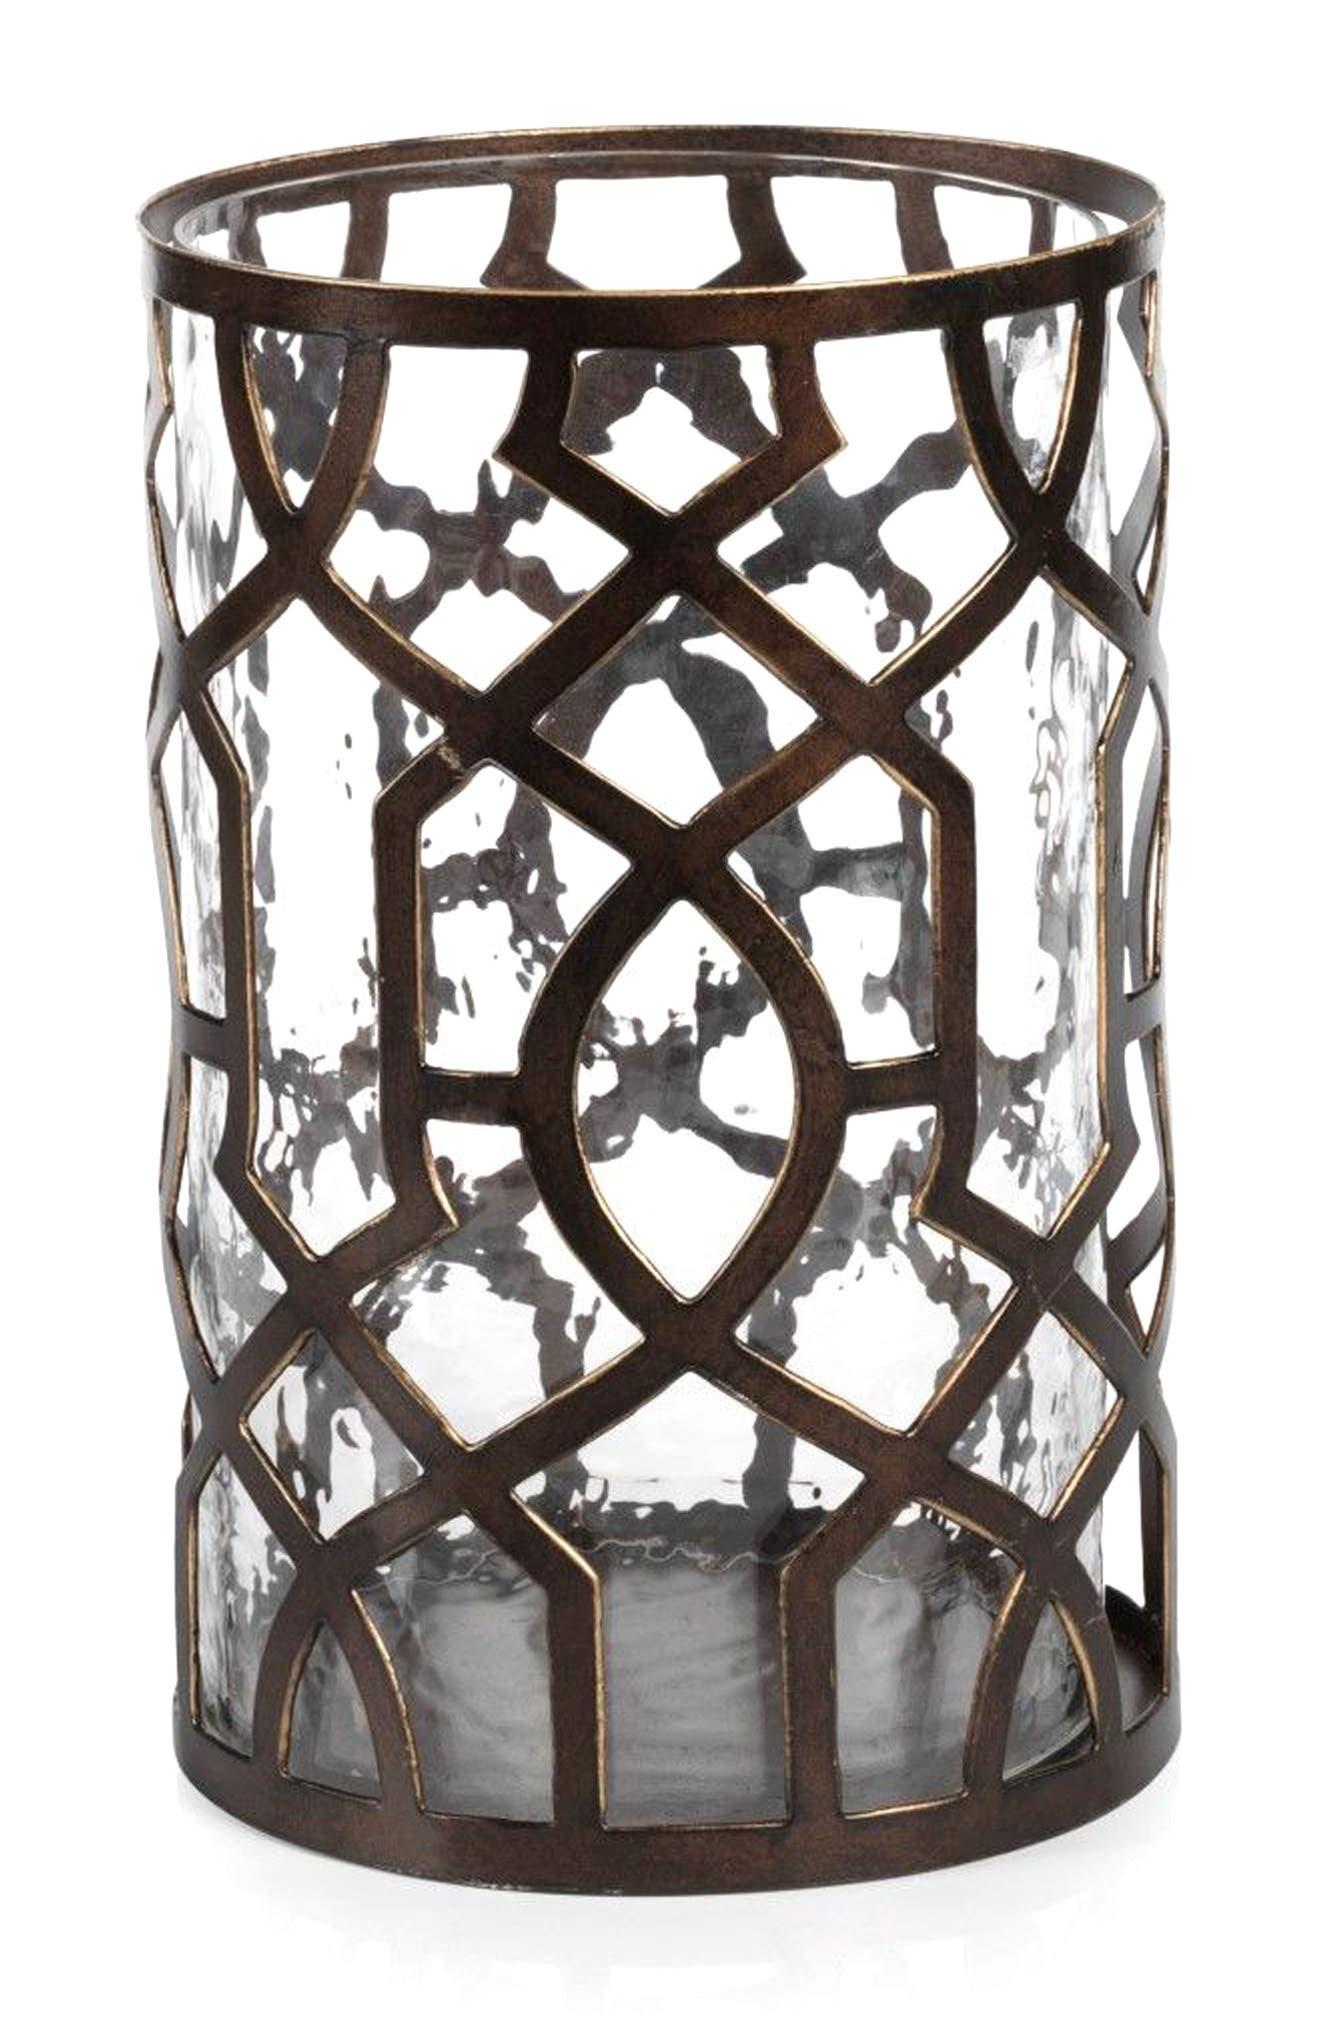 Large Trocadero Hurricane Candle Holder,                             Main thumbnail 1, color,                             Metallic/ Silver/ Grey